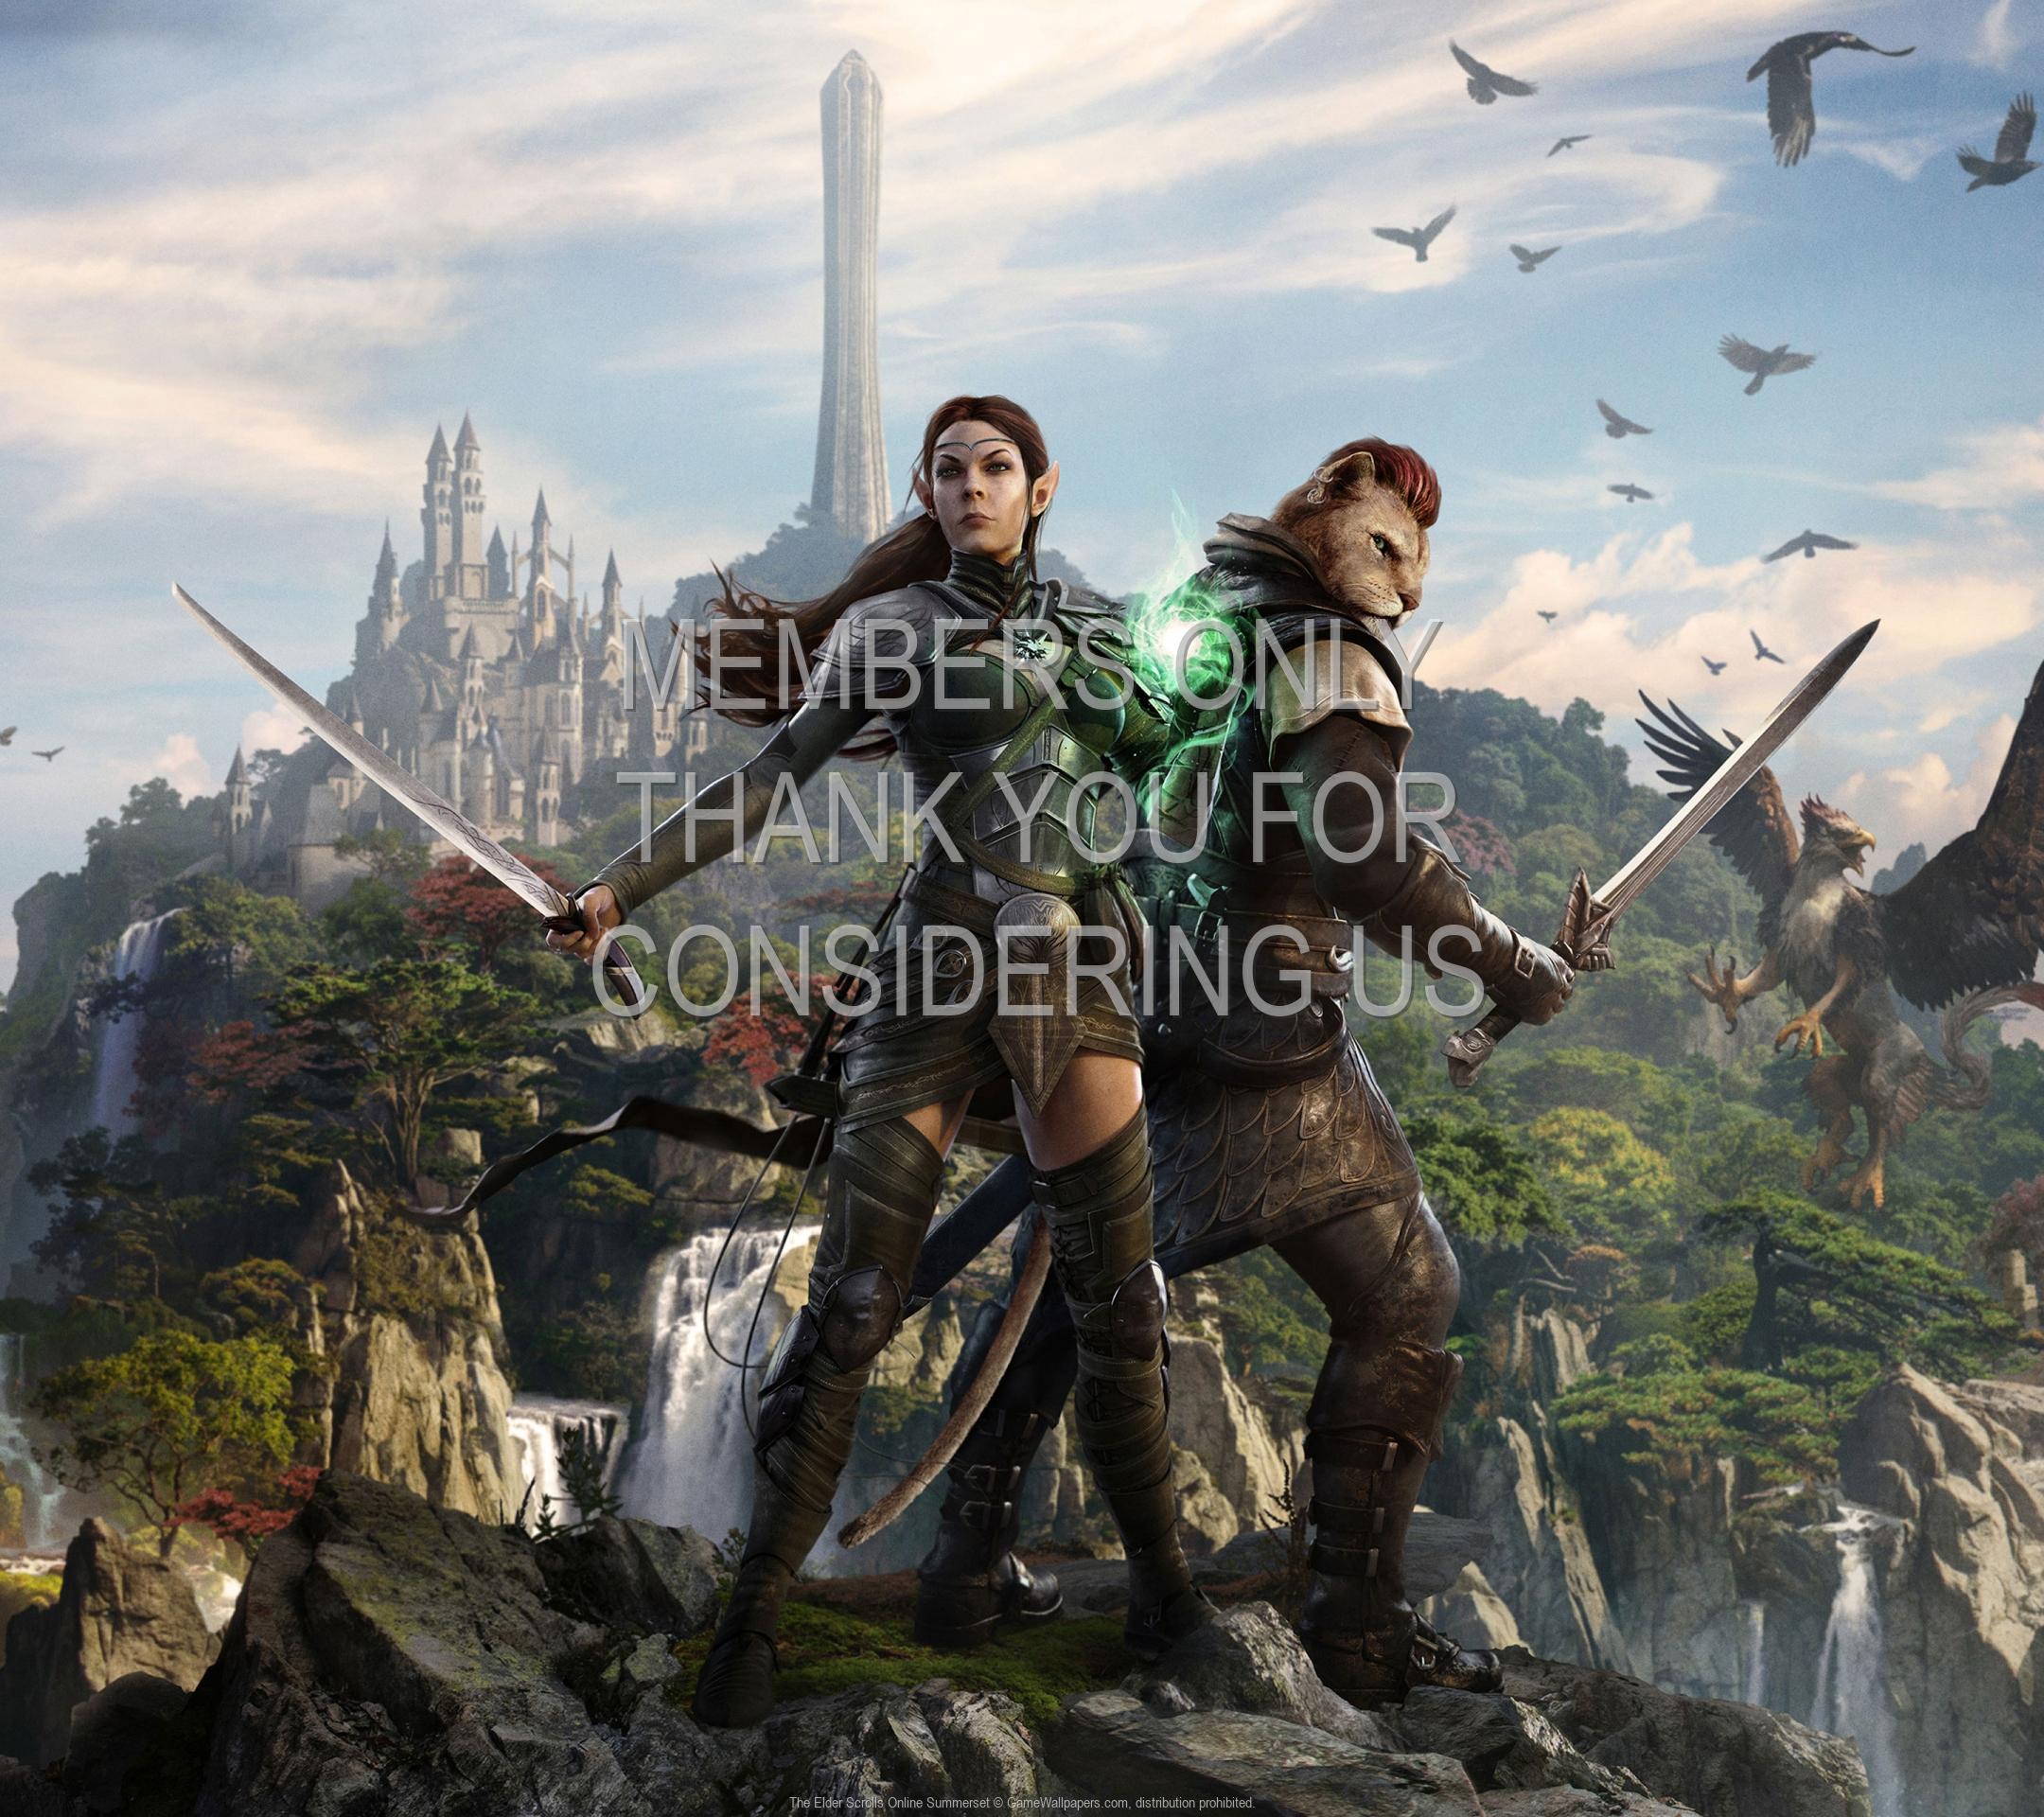 The Elder Scrolls Online: Summerset 1920x1080 Mobile wallpaper or background 01